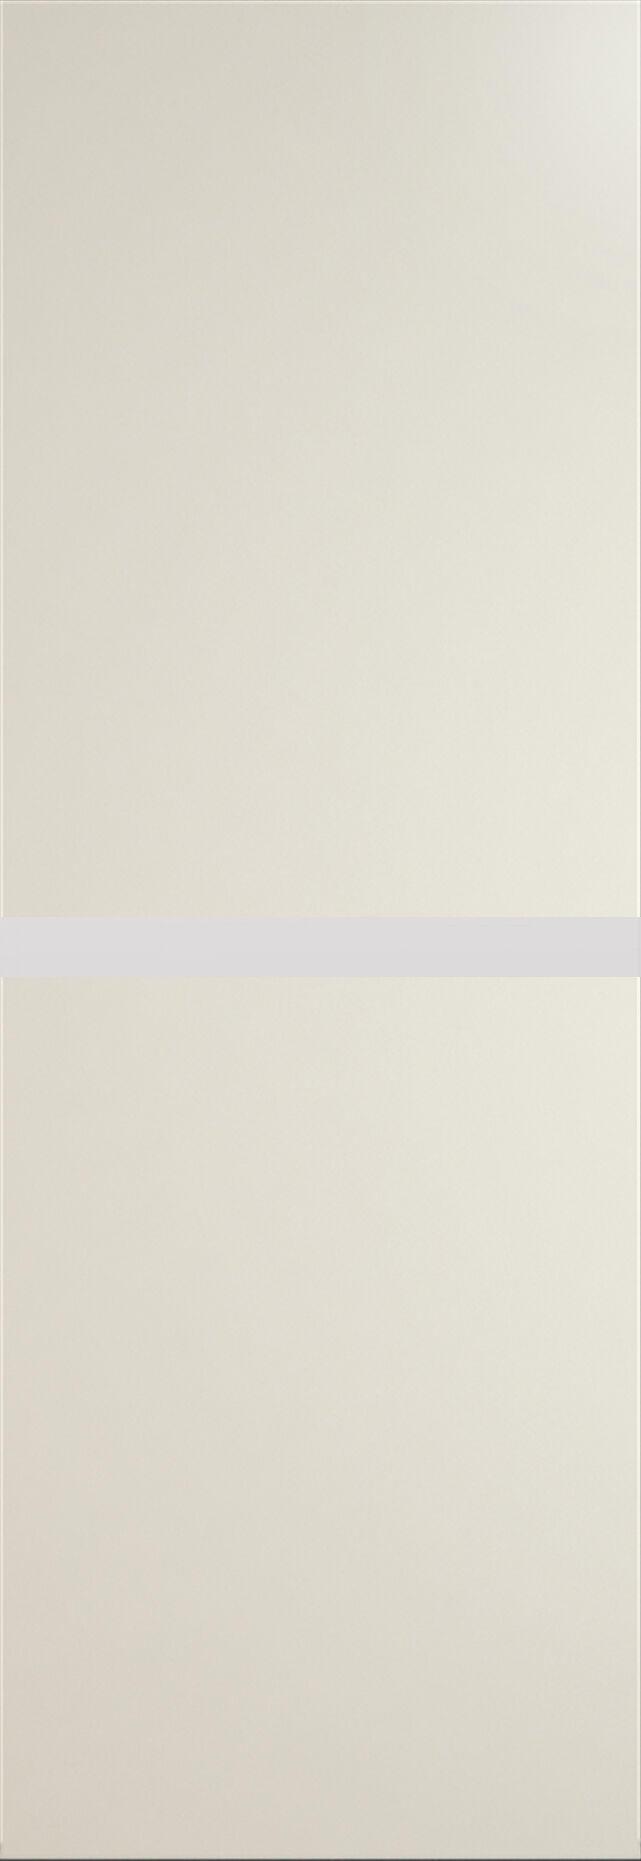 Tivoli Б-4 Invisible цвет - Жемчужная эмаль Без стекла (ДГ)